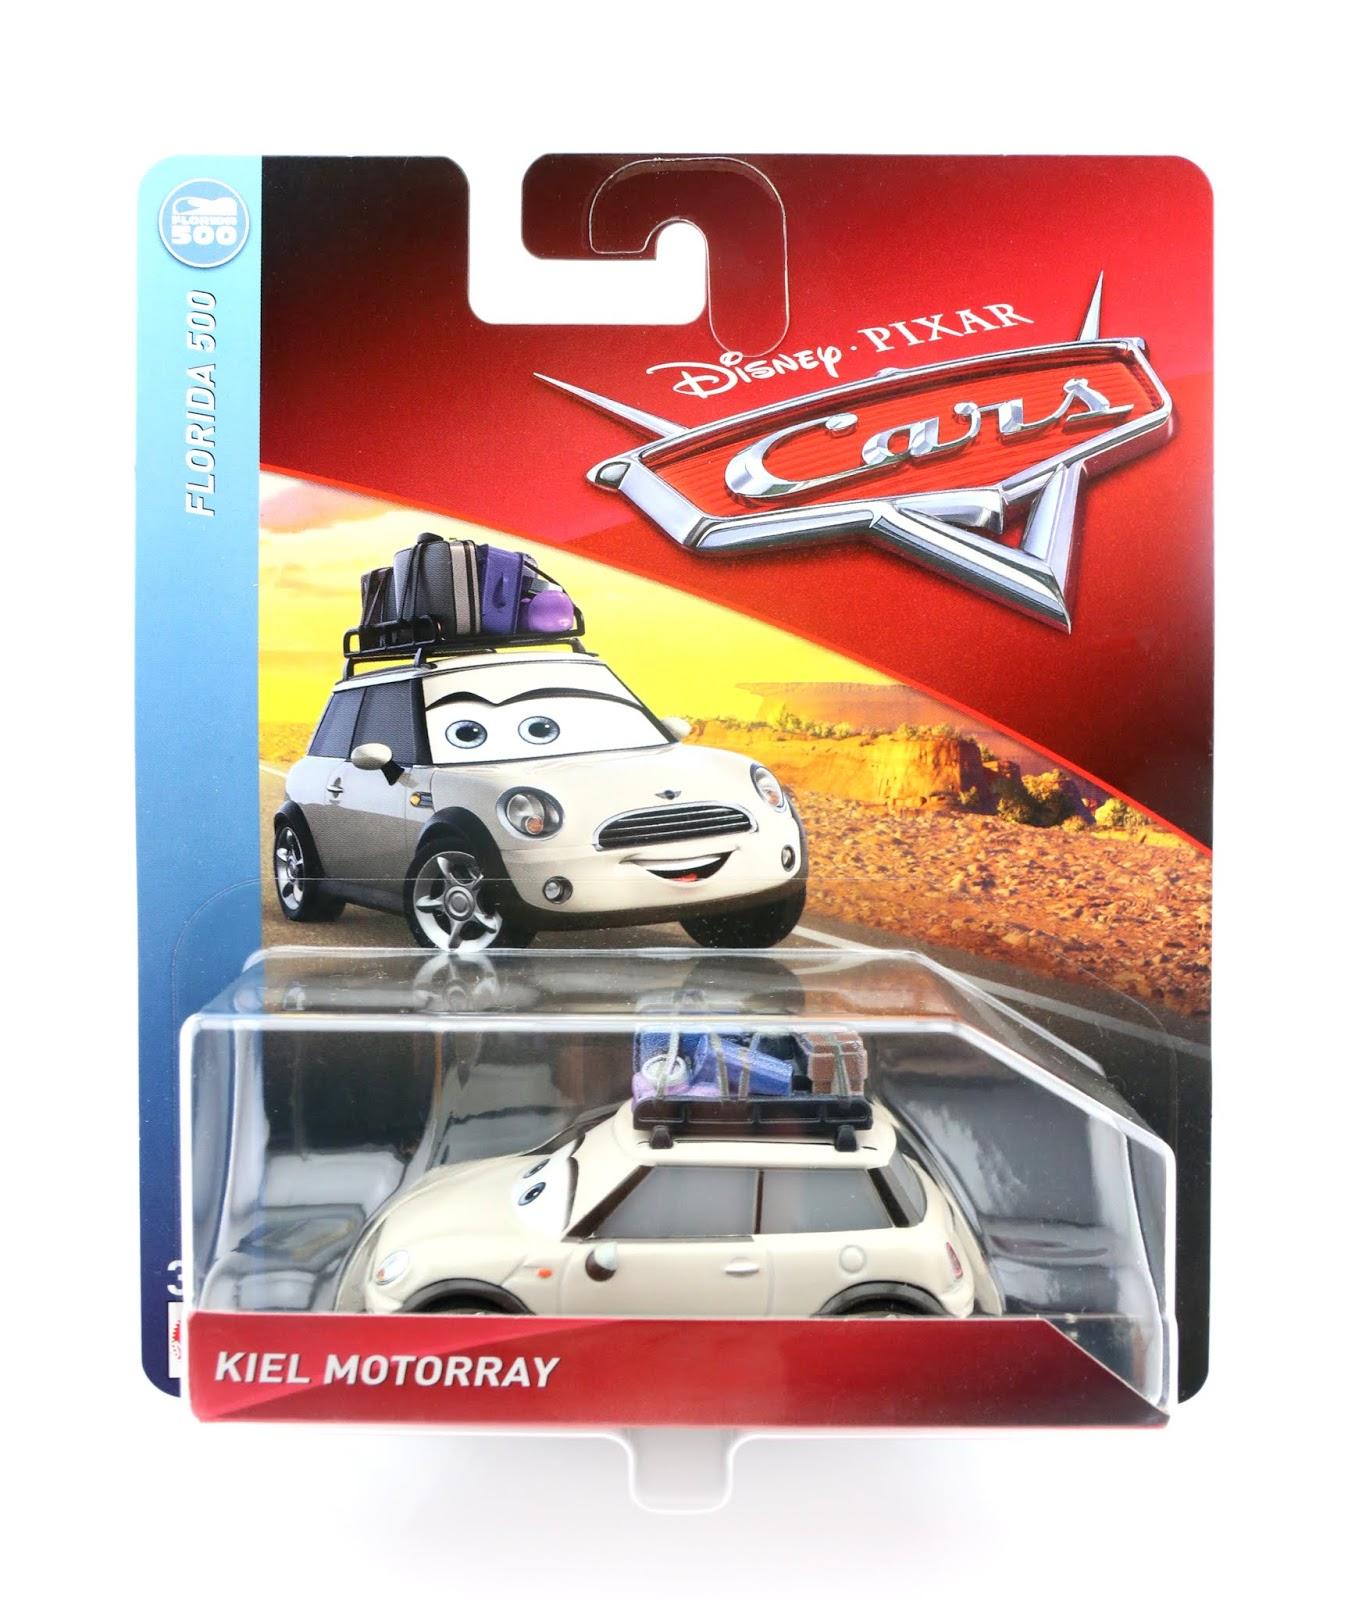 Cars 3 Kiel Motorray